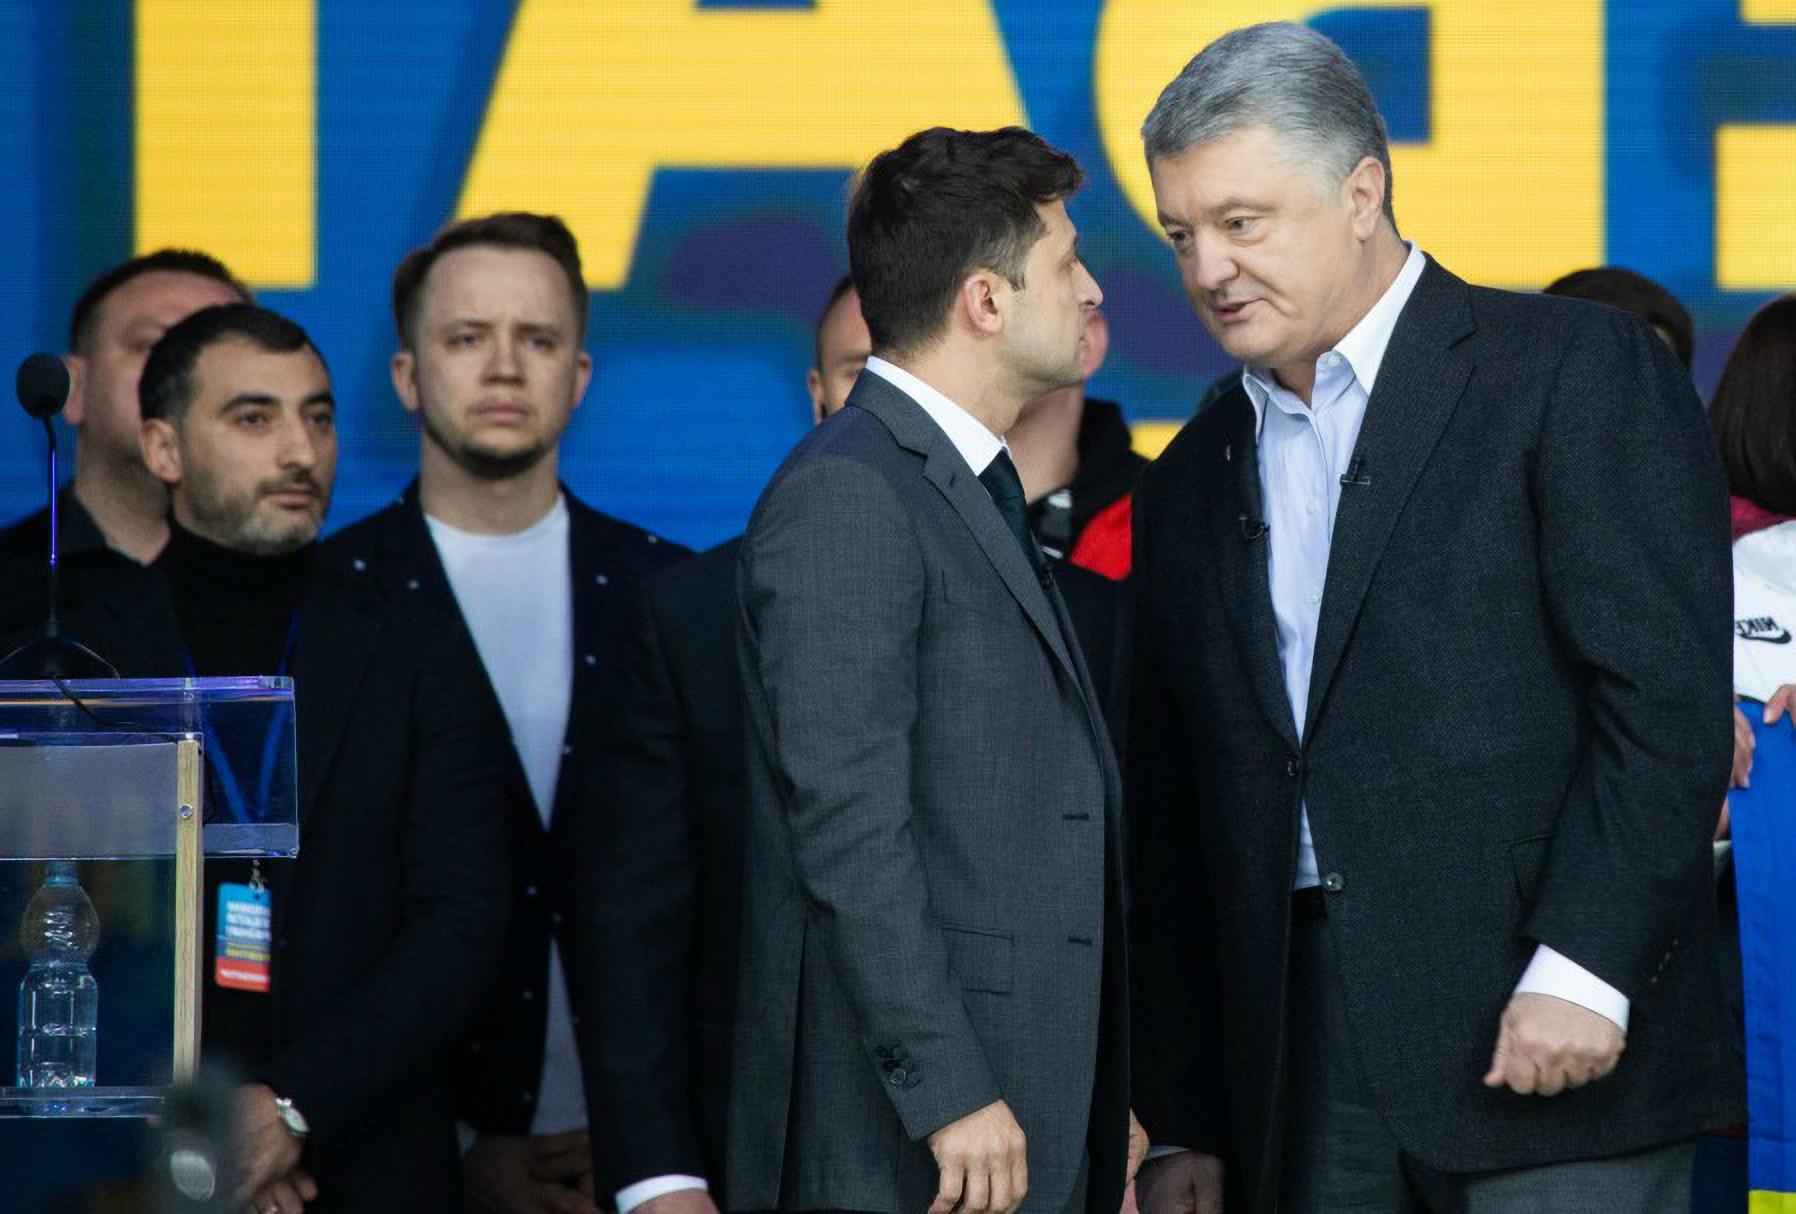 Debates_of_Petro_Poroshenko_and_Vladimir